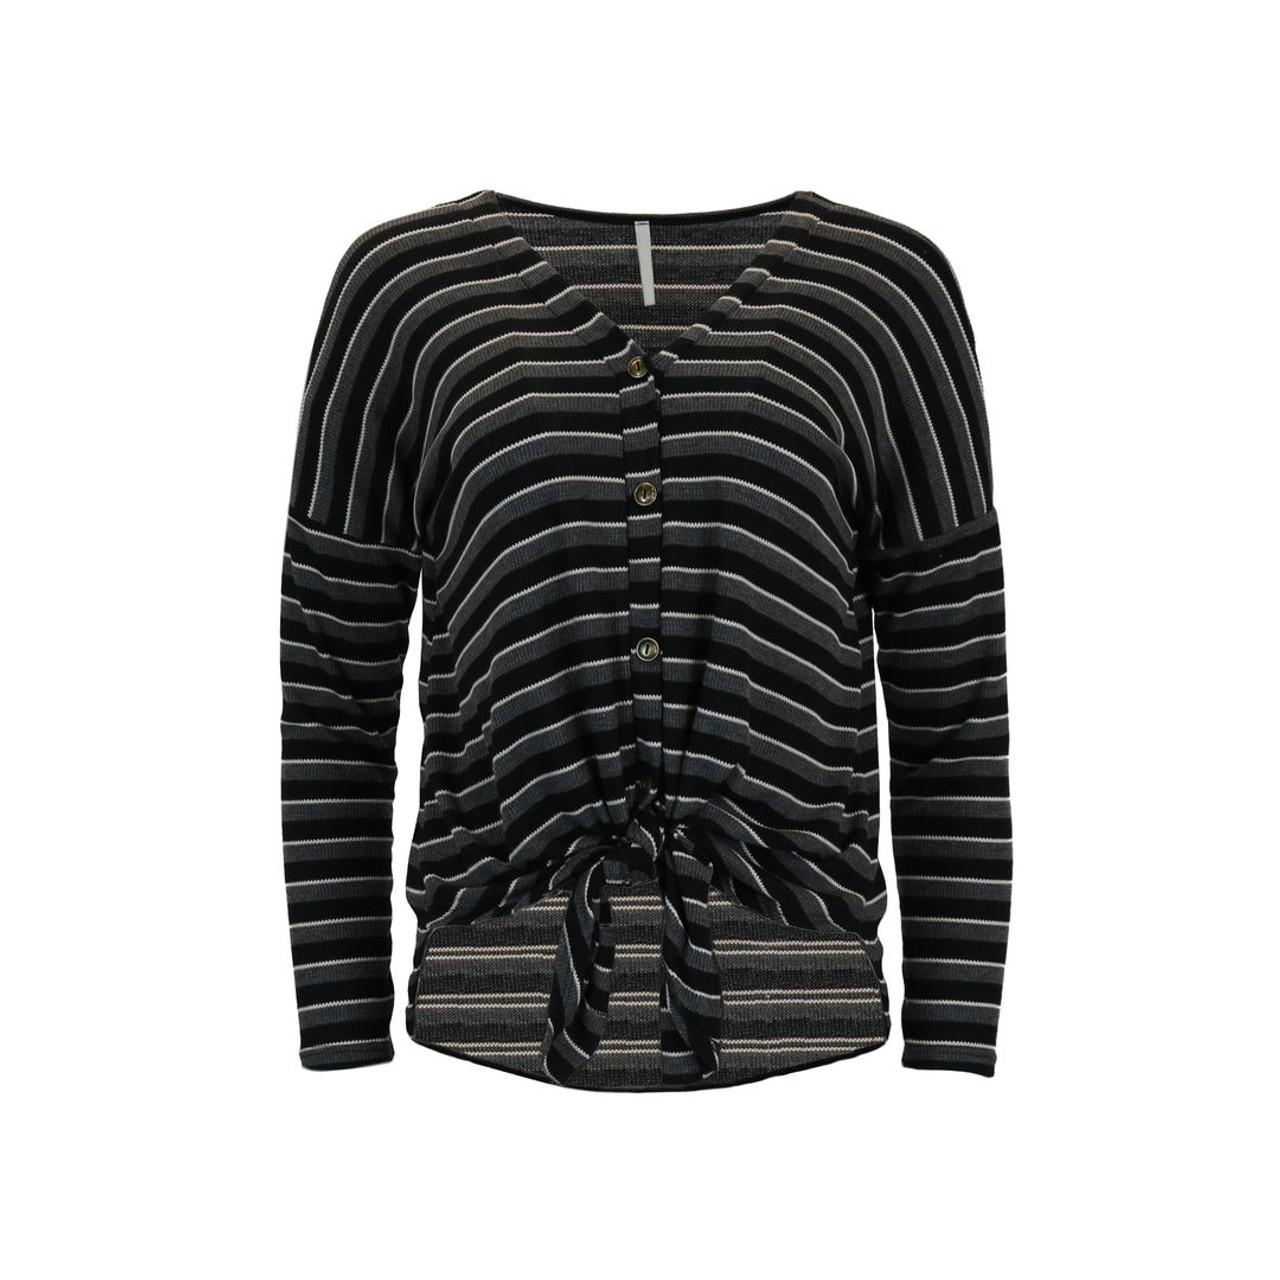 2d00d962d2a Thermal Striped V-Neck Top - Black